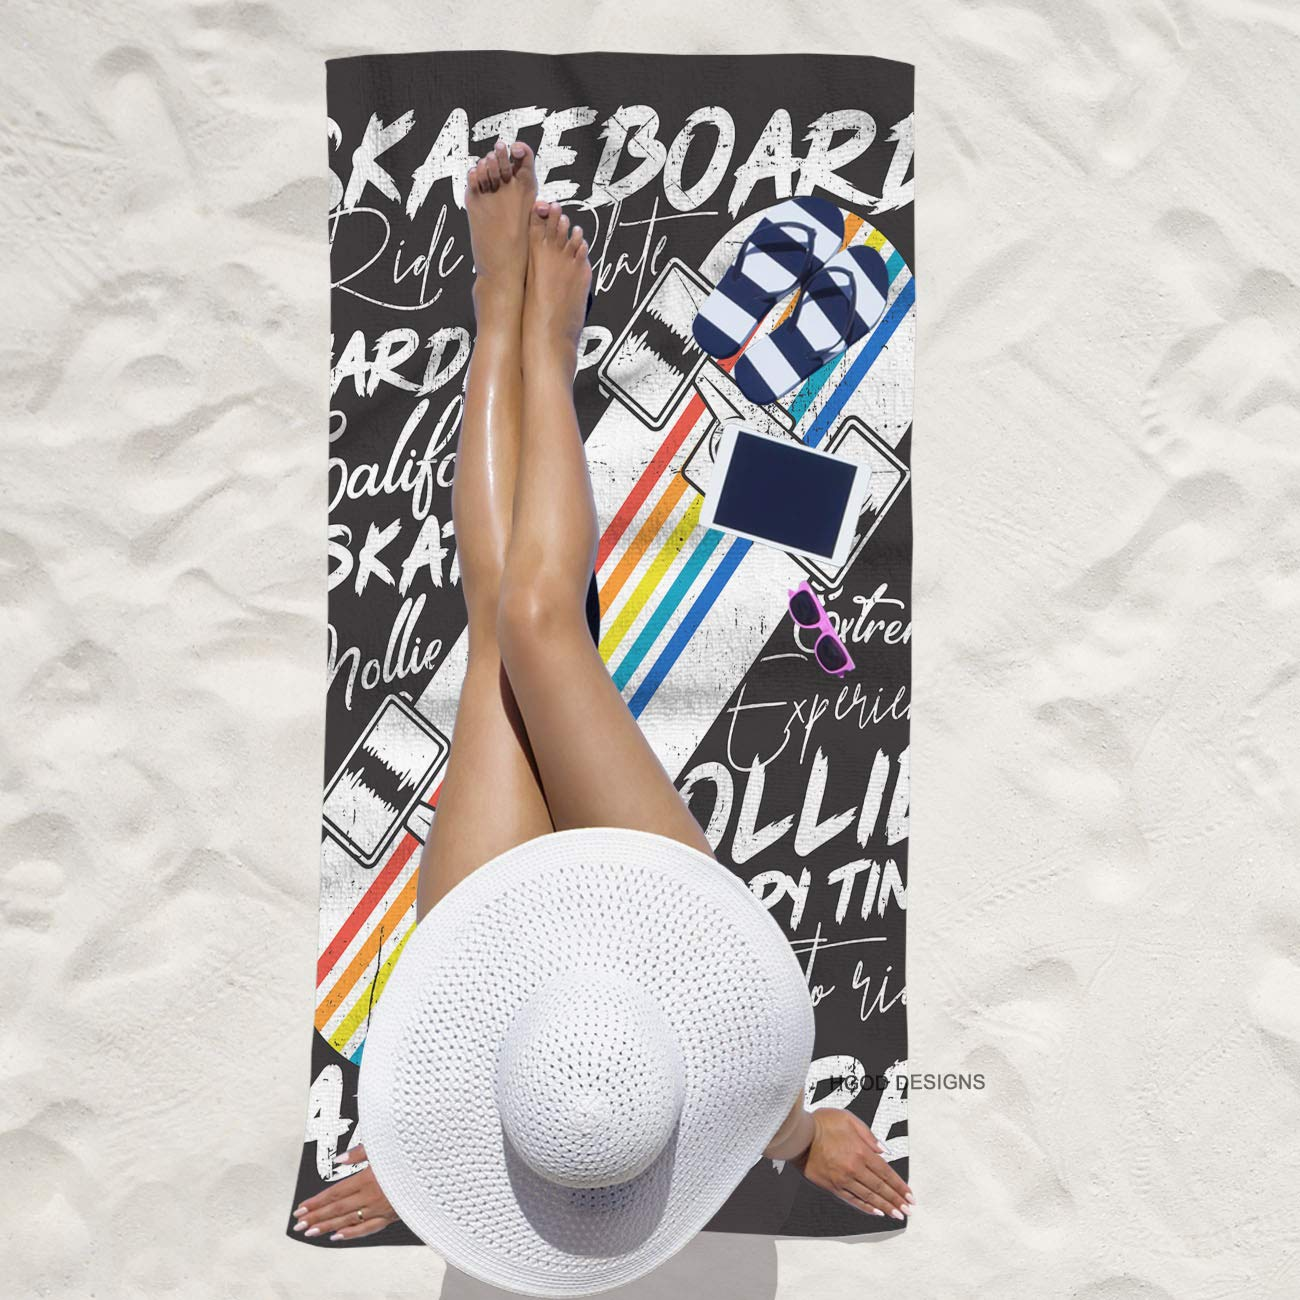 HGOD DESIGNS Bath Towel Skateboard,Colorful Skateboard Poster Design Bath Towel Throw Blanket Beach Towel 64 Lx32 W